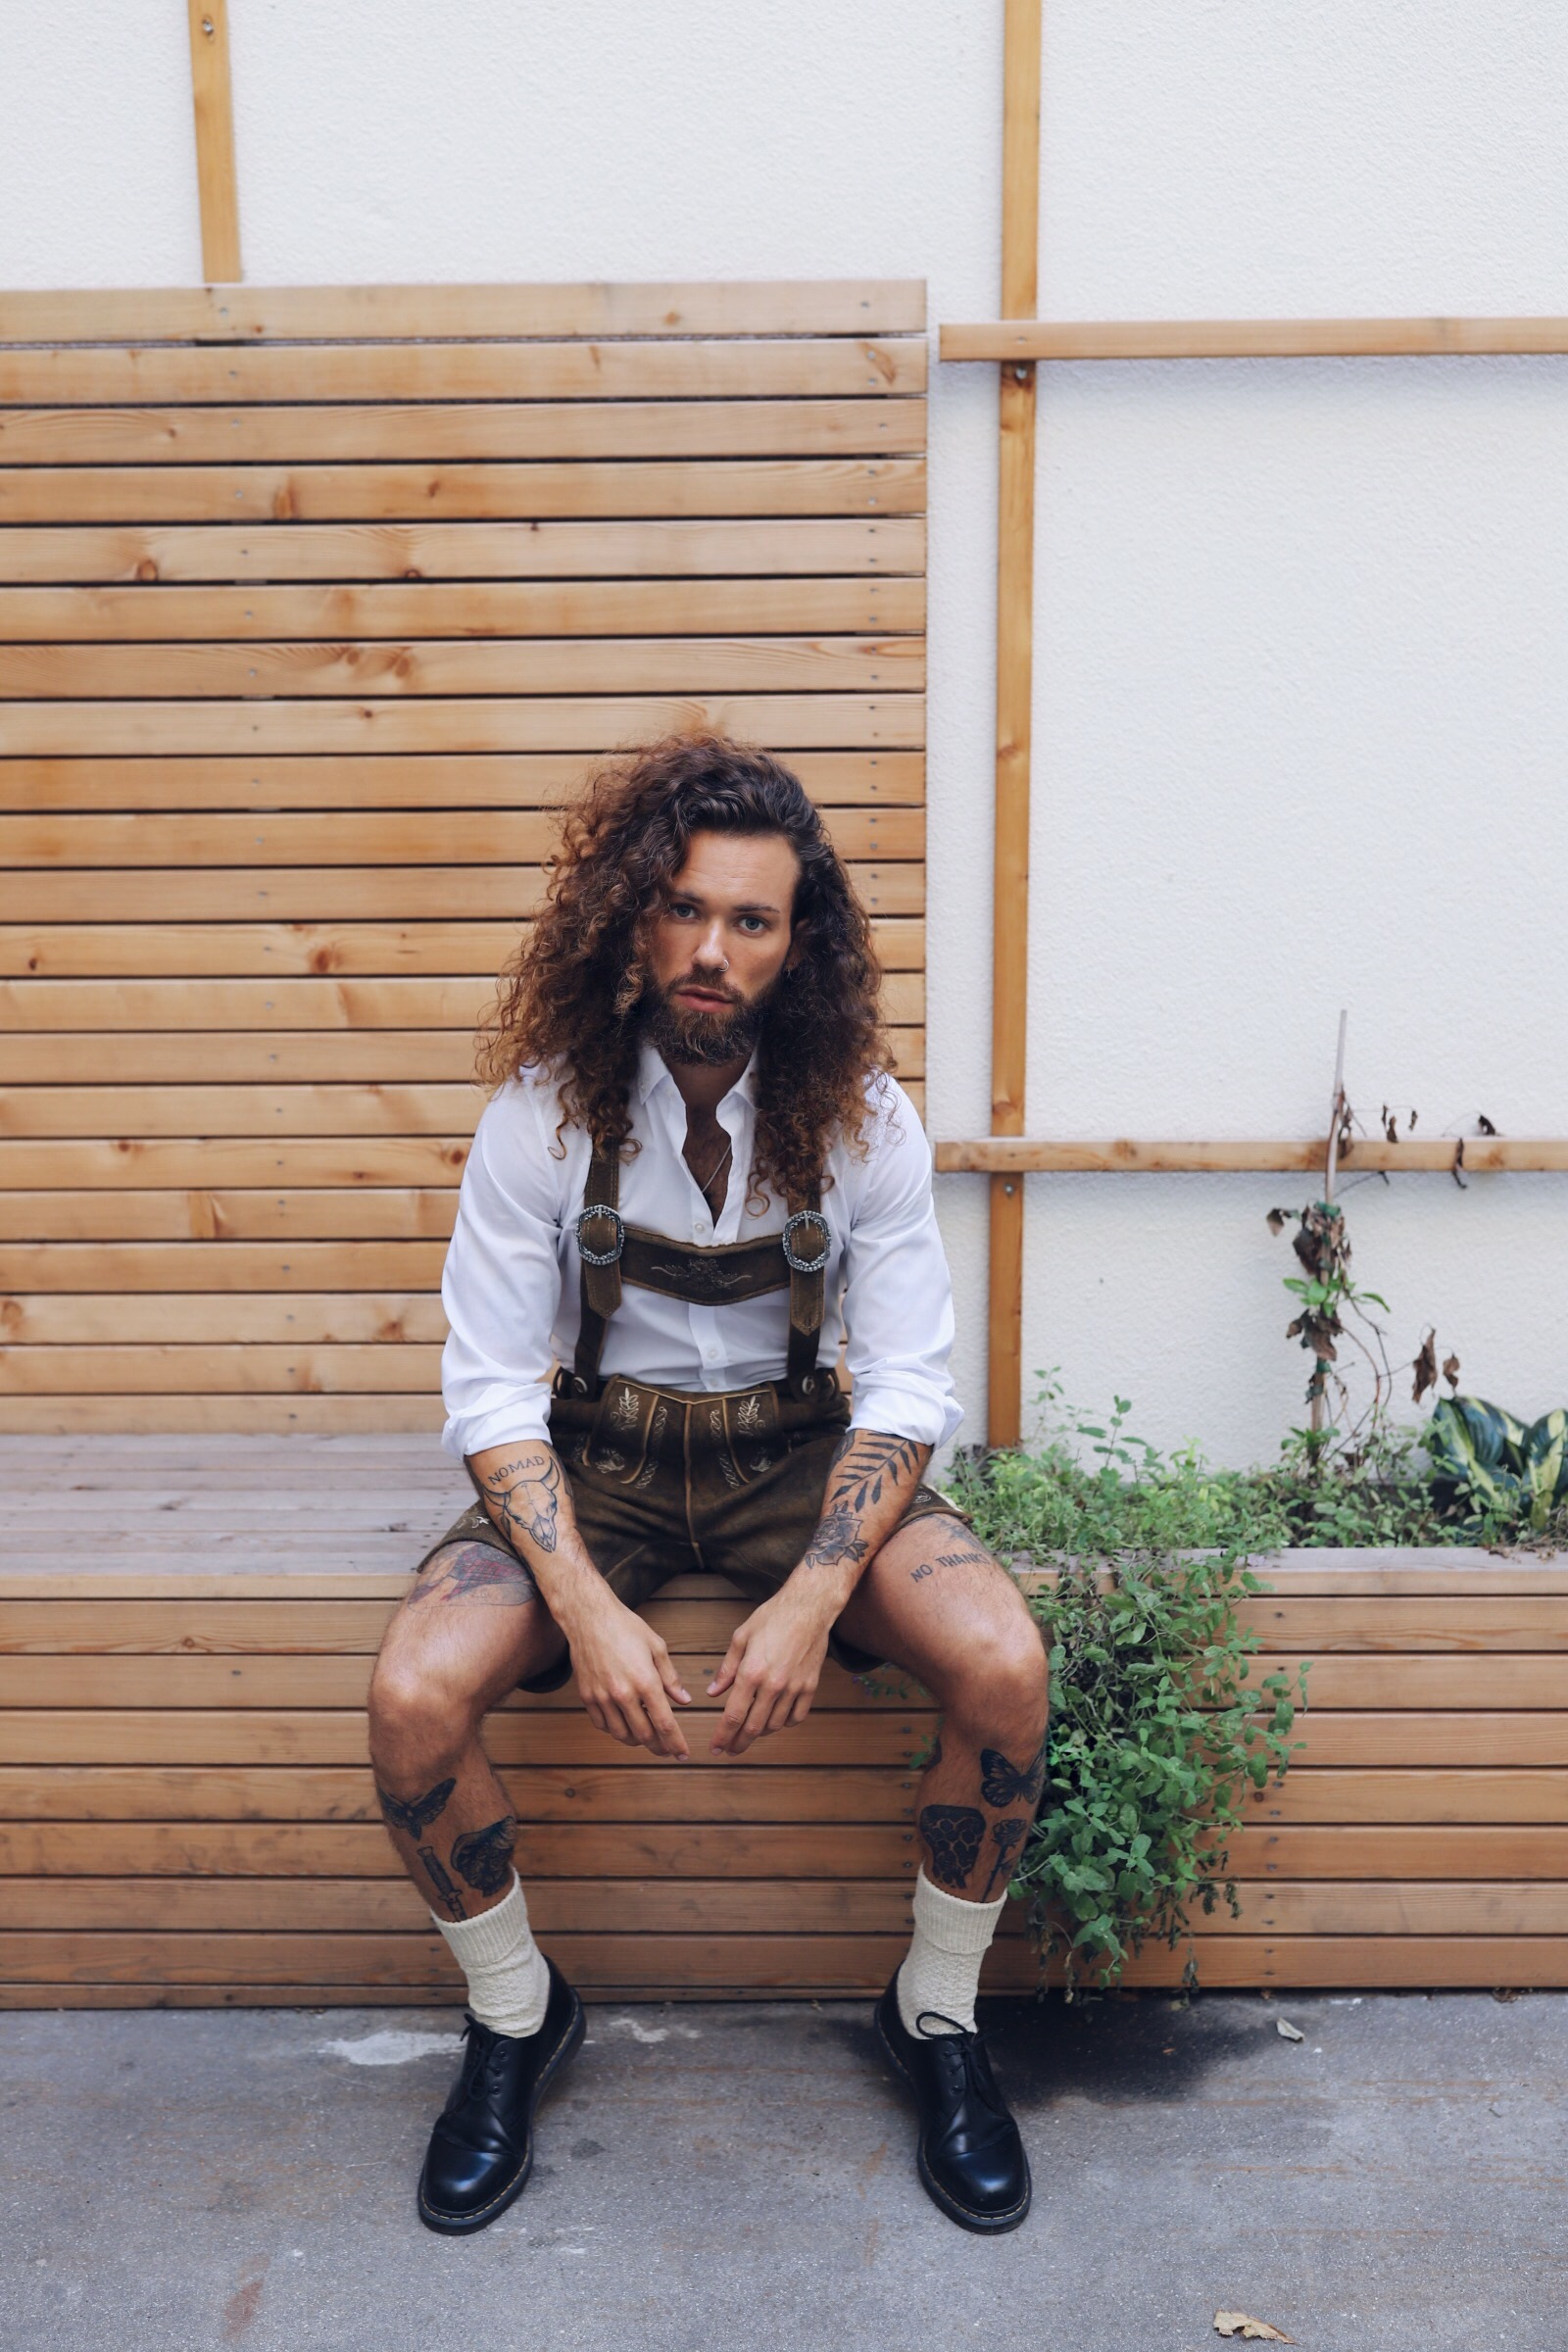 Vienna blogger, men blogger, man bun, manbun, hipster, man blogger, Vienna model, manbun model, manbun inspiration, manbun and beard, bohemian style, festival style man, bohemian style man